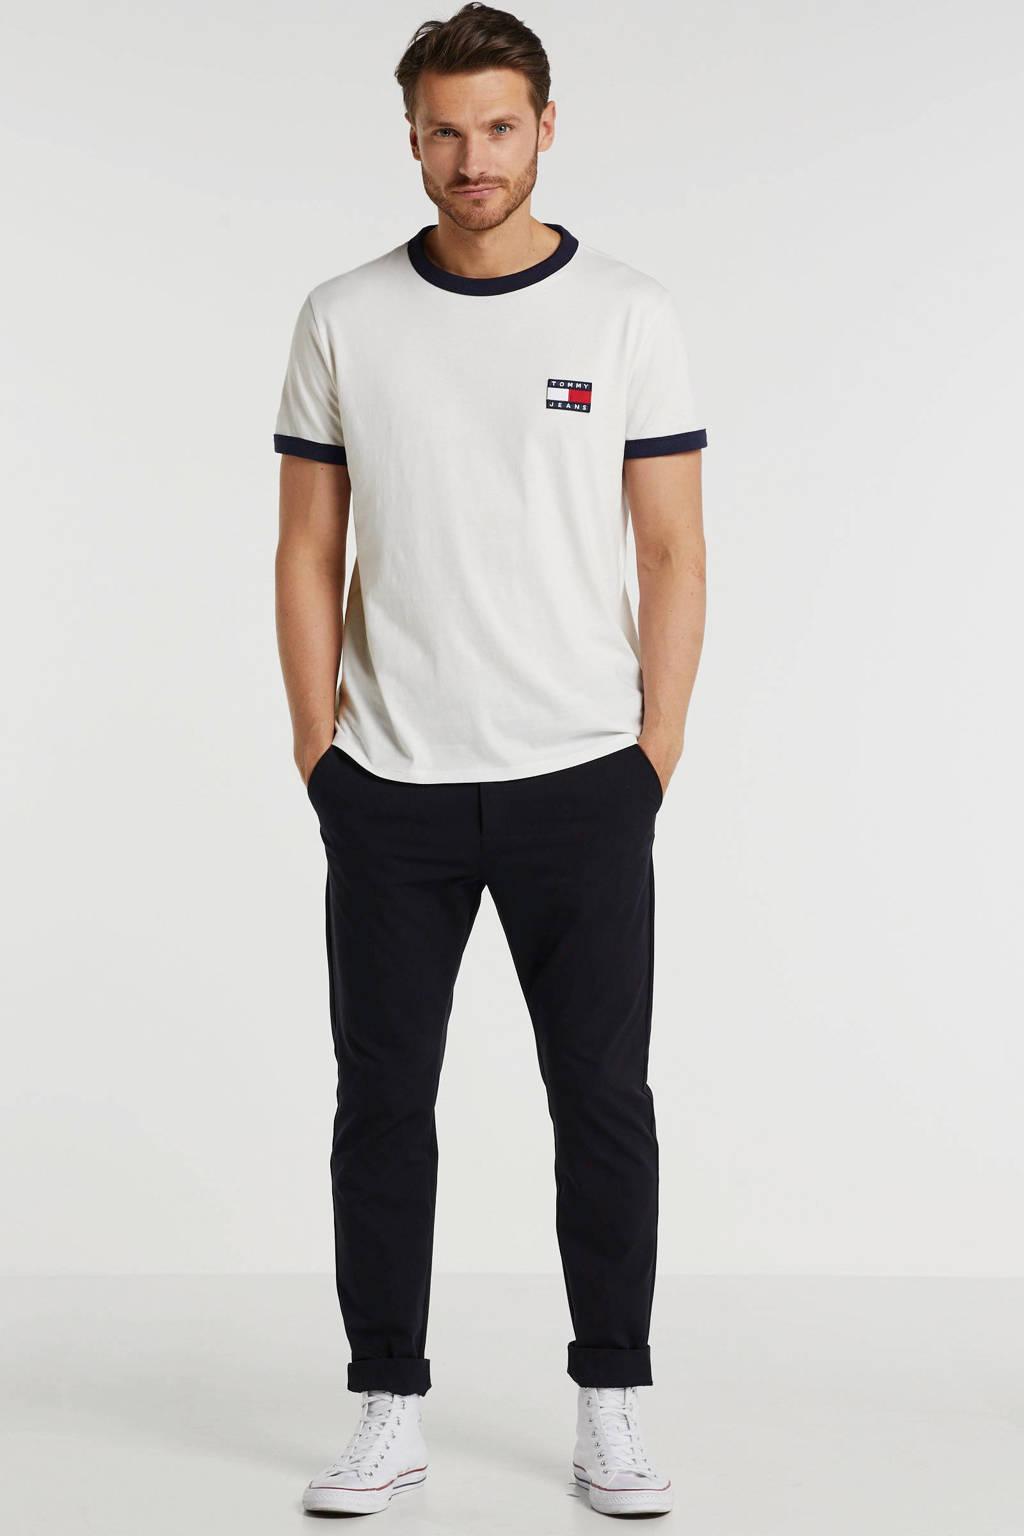 Tommy Jeans T-shirt met logo wit, Wit